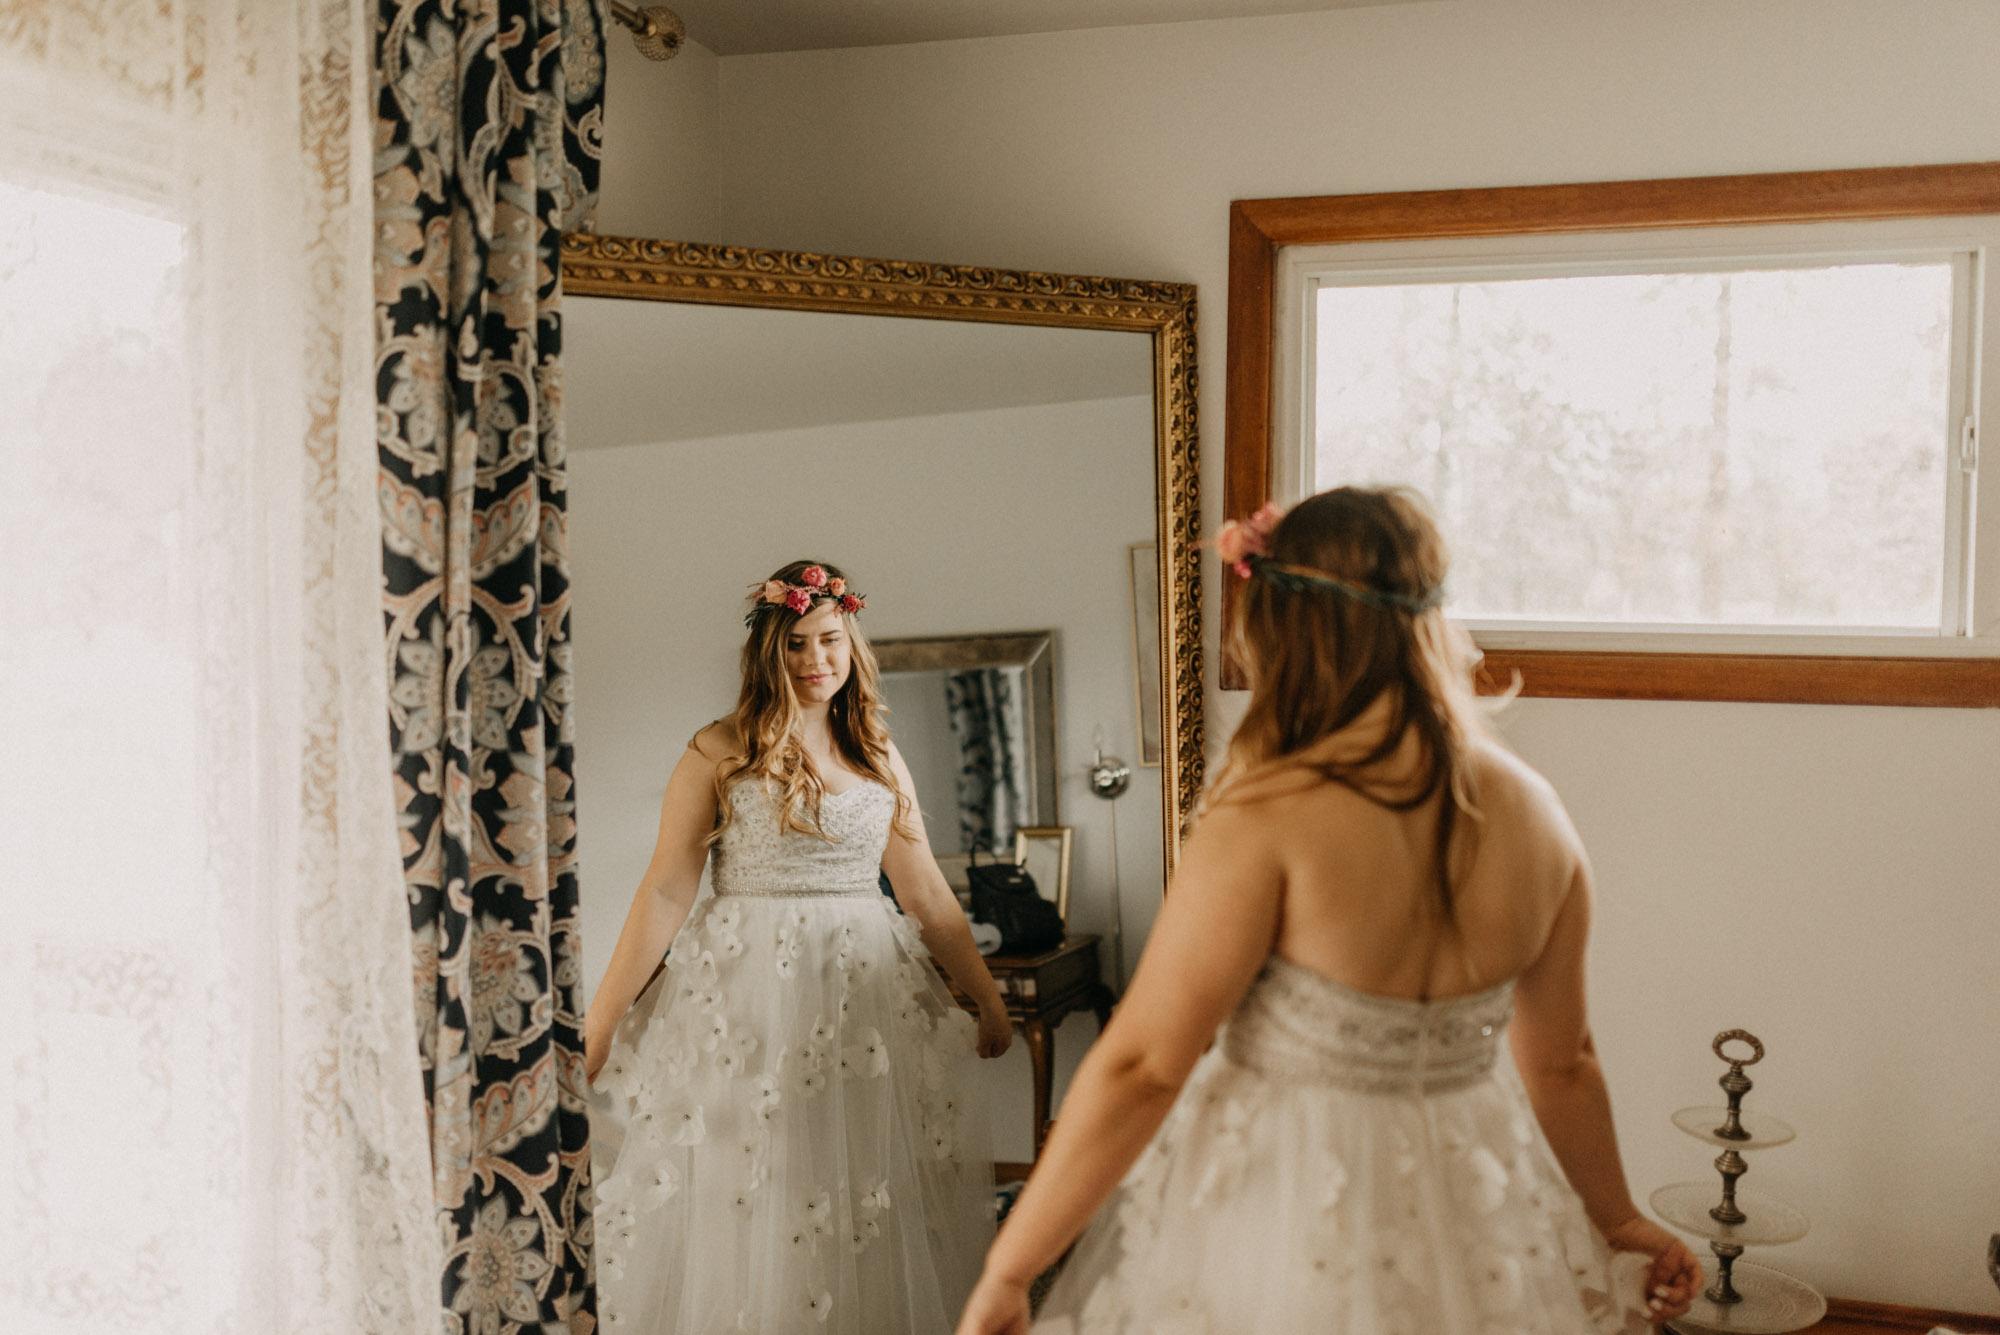 Getting-Ready-Swingset-Washington-Wedding-ringshot-8007.jpg